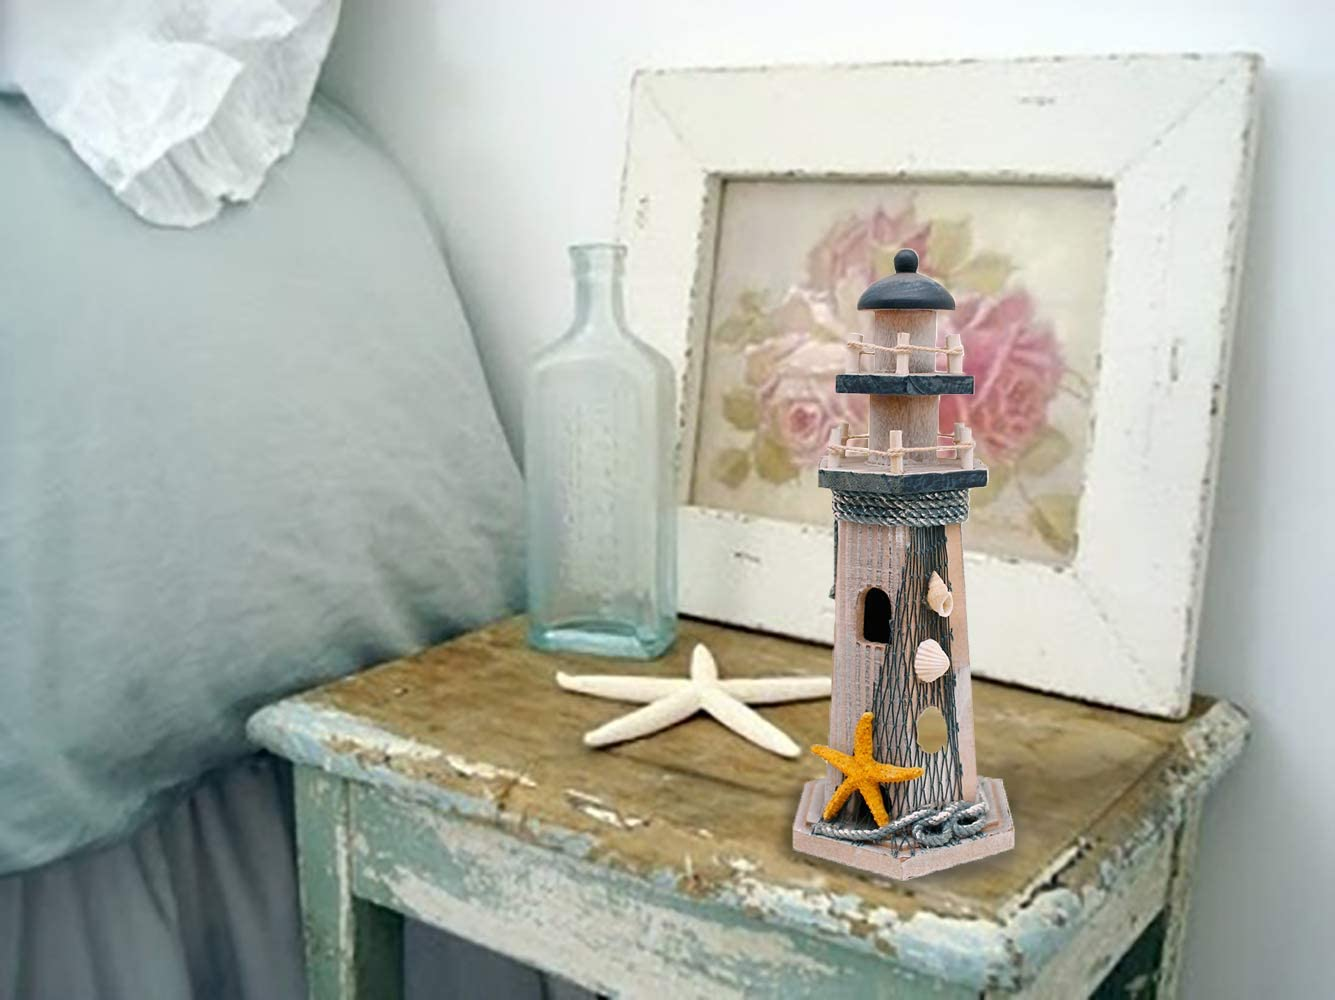 Wooden Lighthouse Seaside Decor Marine Ornament Anchor /& Shell /& Net Photograph Setting 14.5 H, Fish /& Starfish WHY Decor Handmade Cute Lighthouse Home Decor Article